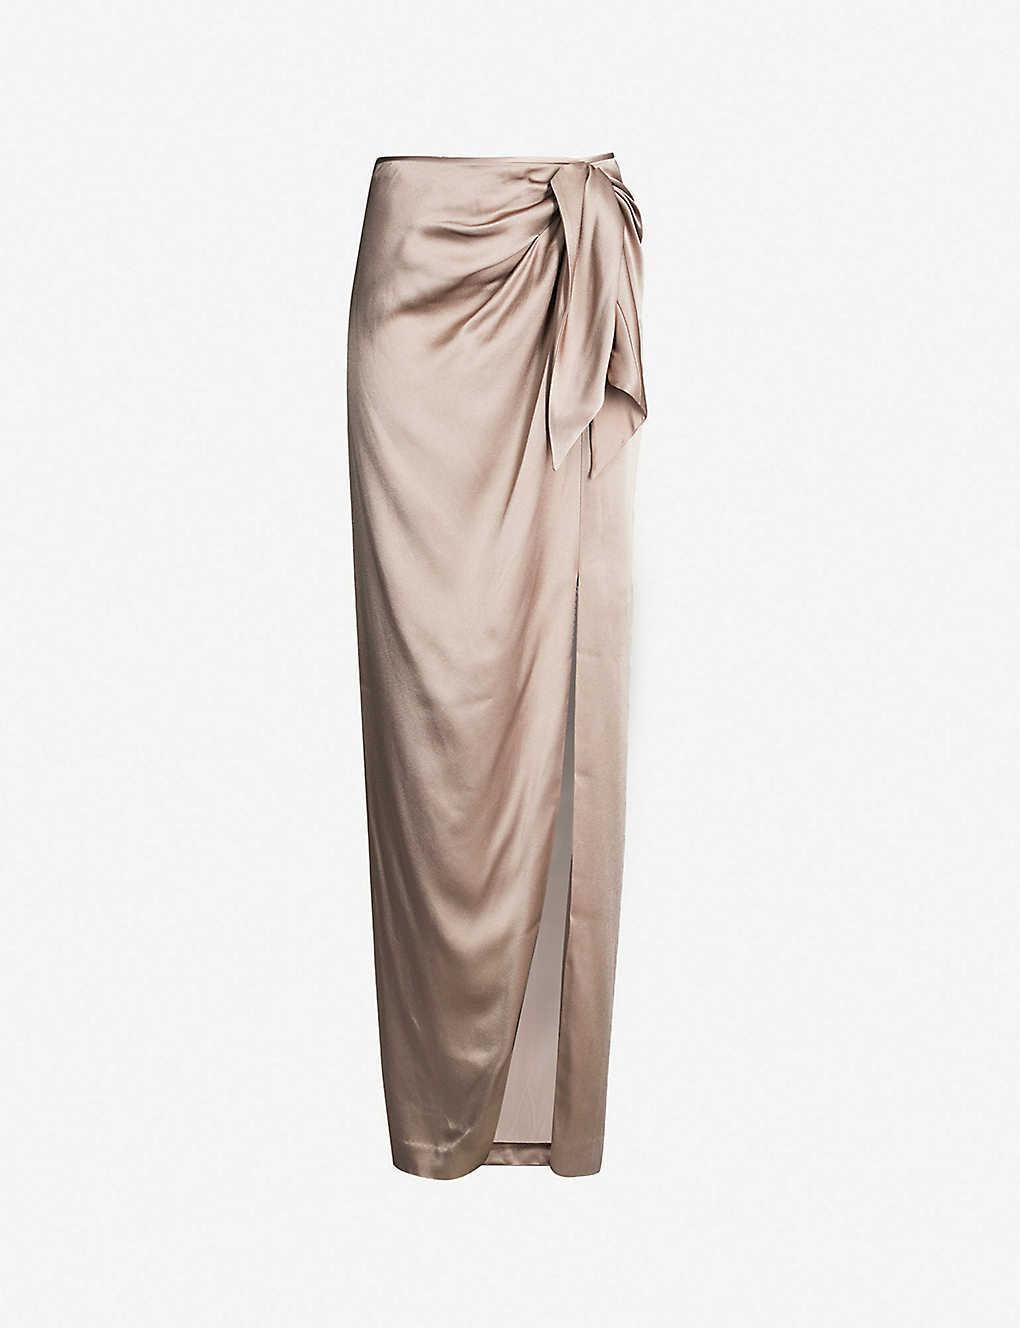 a0e24aae2260 ST JOHN - Ruched satin maxi skirt | Selfridges.com